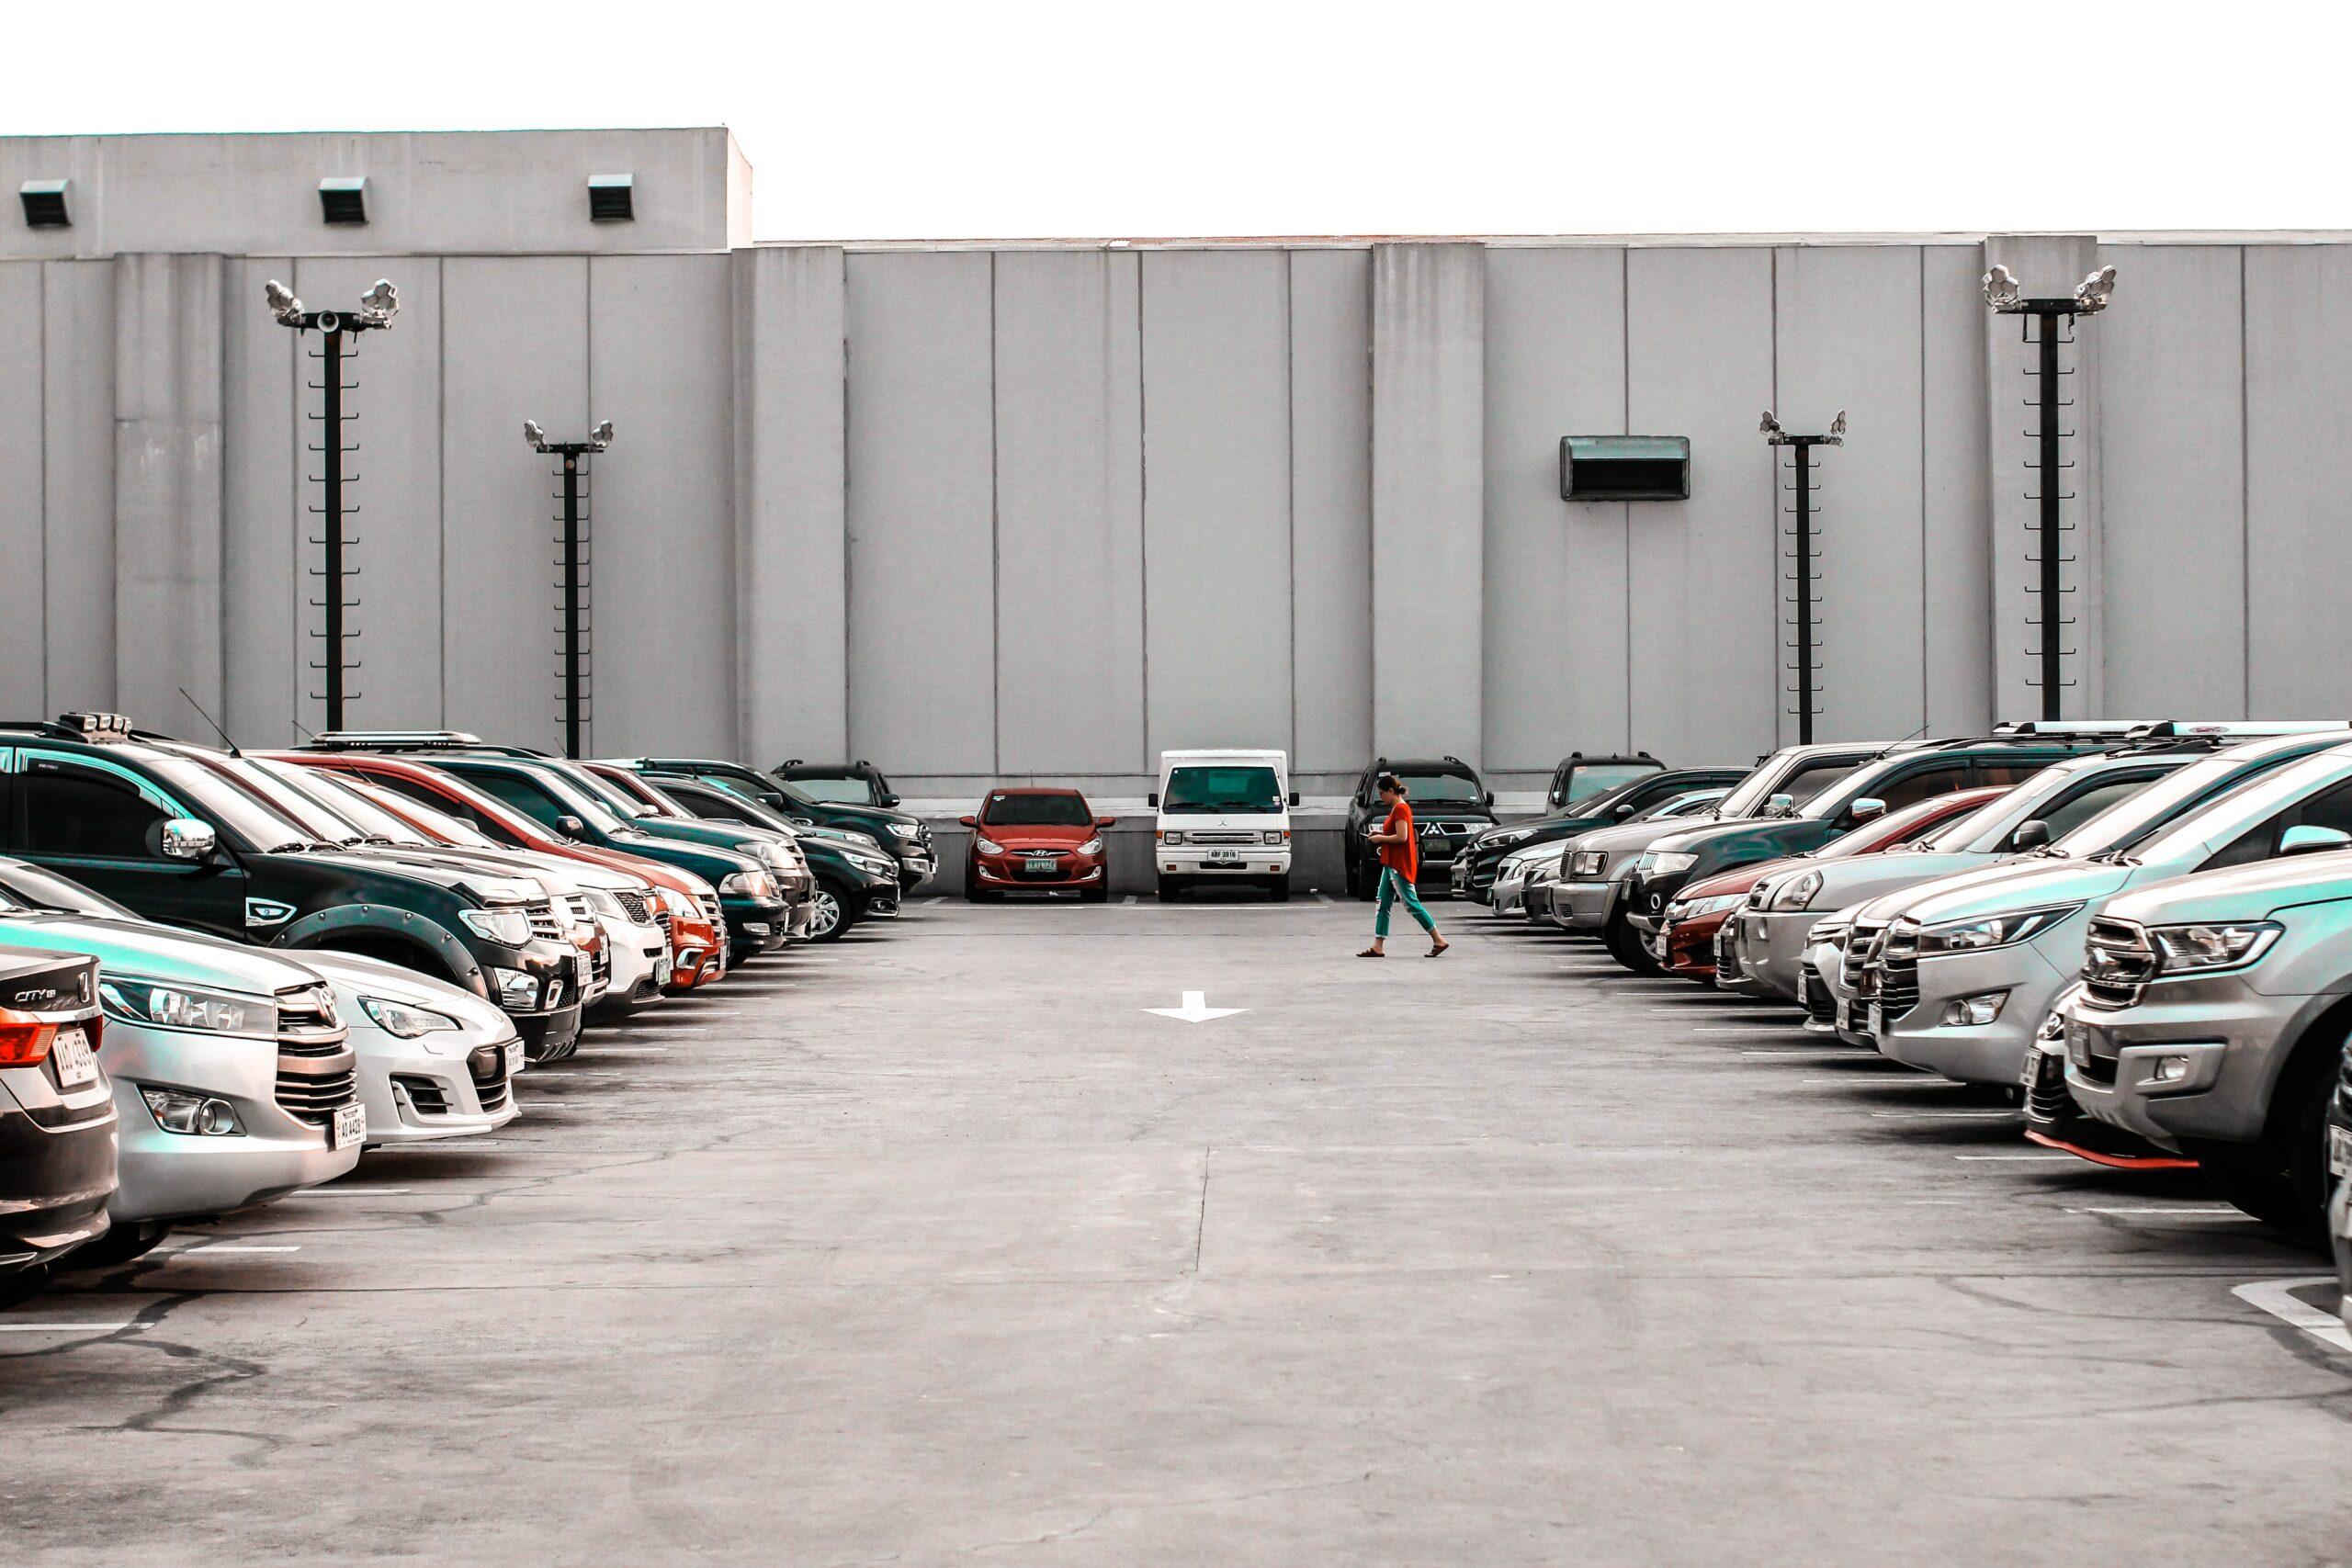 Eco-friendly parking lot from Houston concrete supplier Texas Concrete Ready Mix